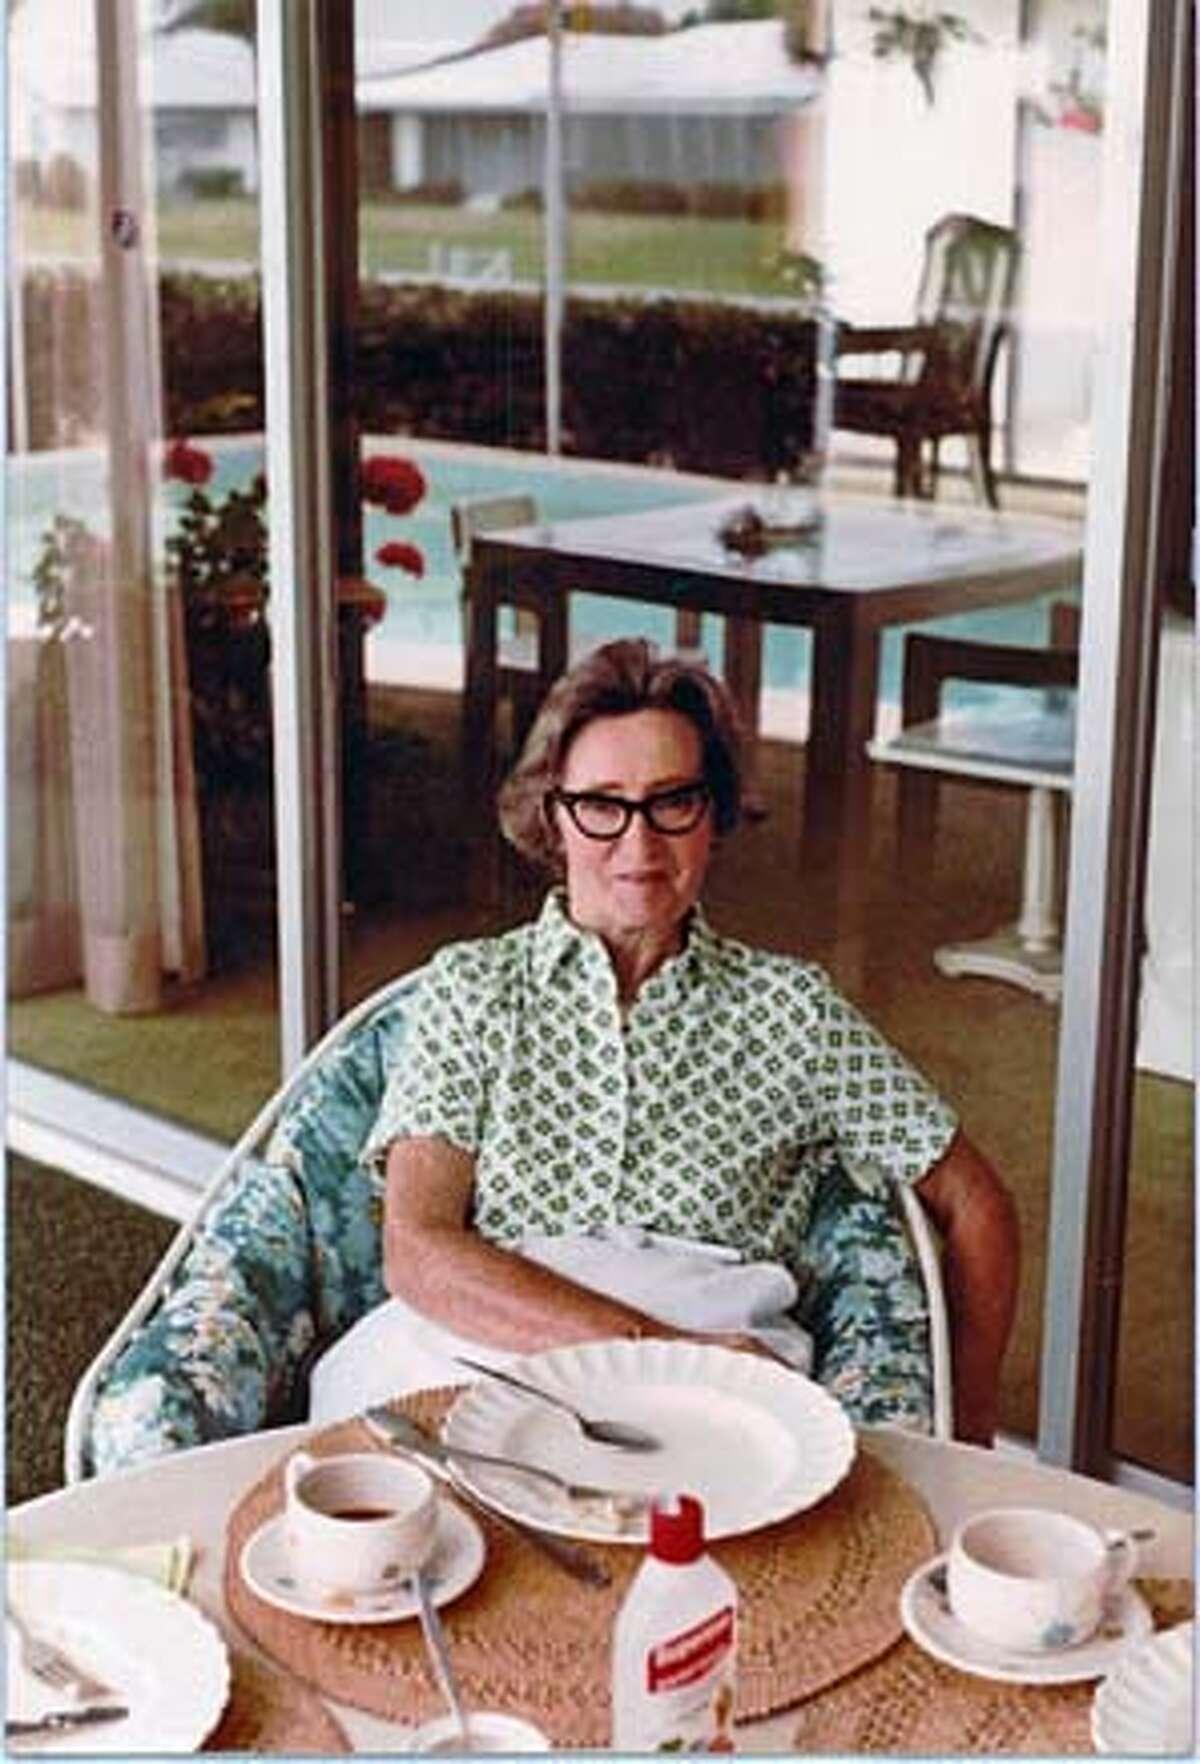 Obituary photo of Mimi Makowsky.